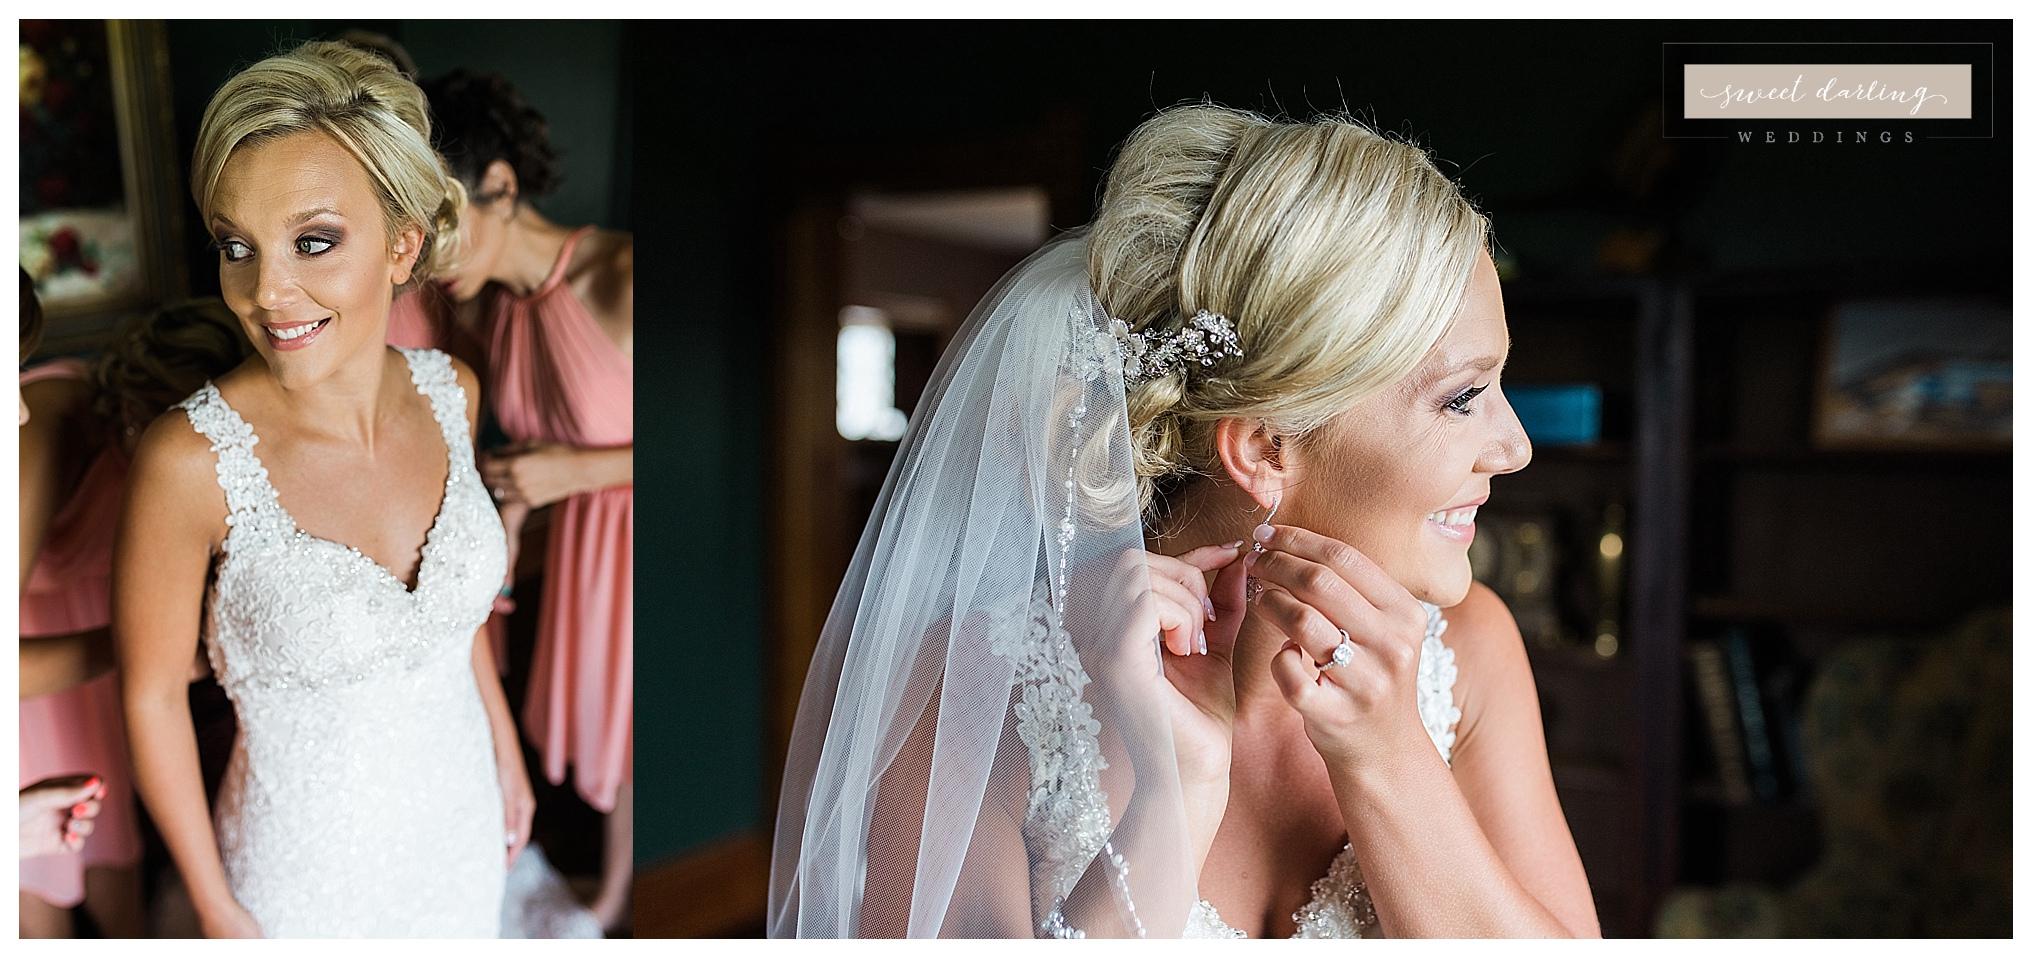 Paxton-illinois-engelbrecht-farmstead-romantic-wedding-photographer-sweet-darling-weddings_1207.jpg